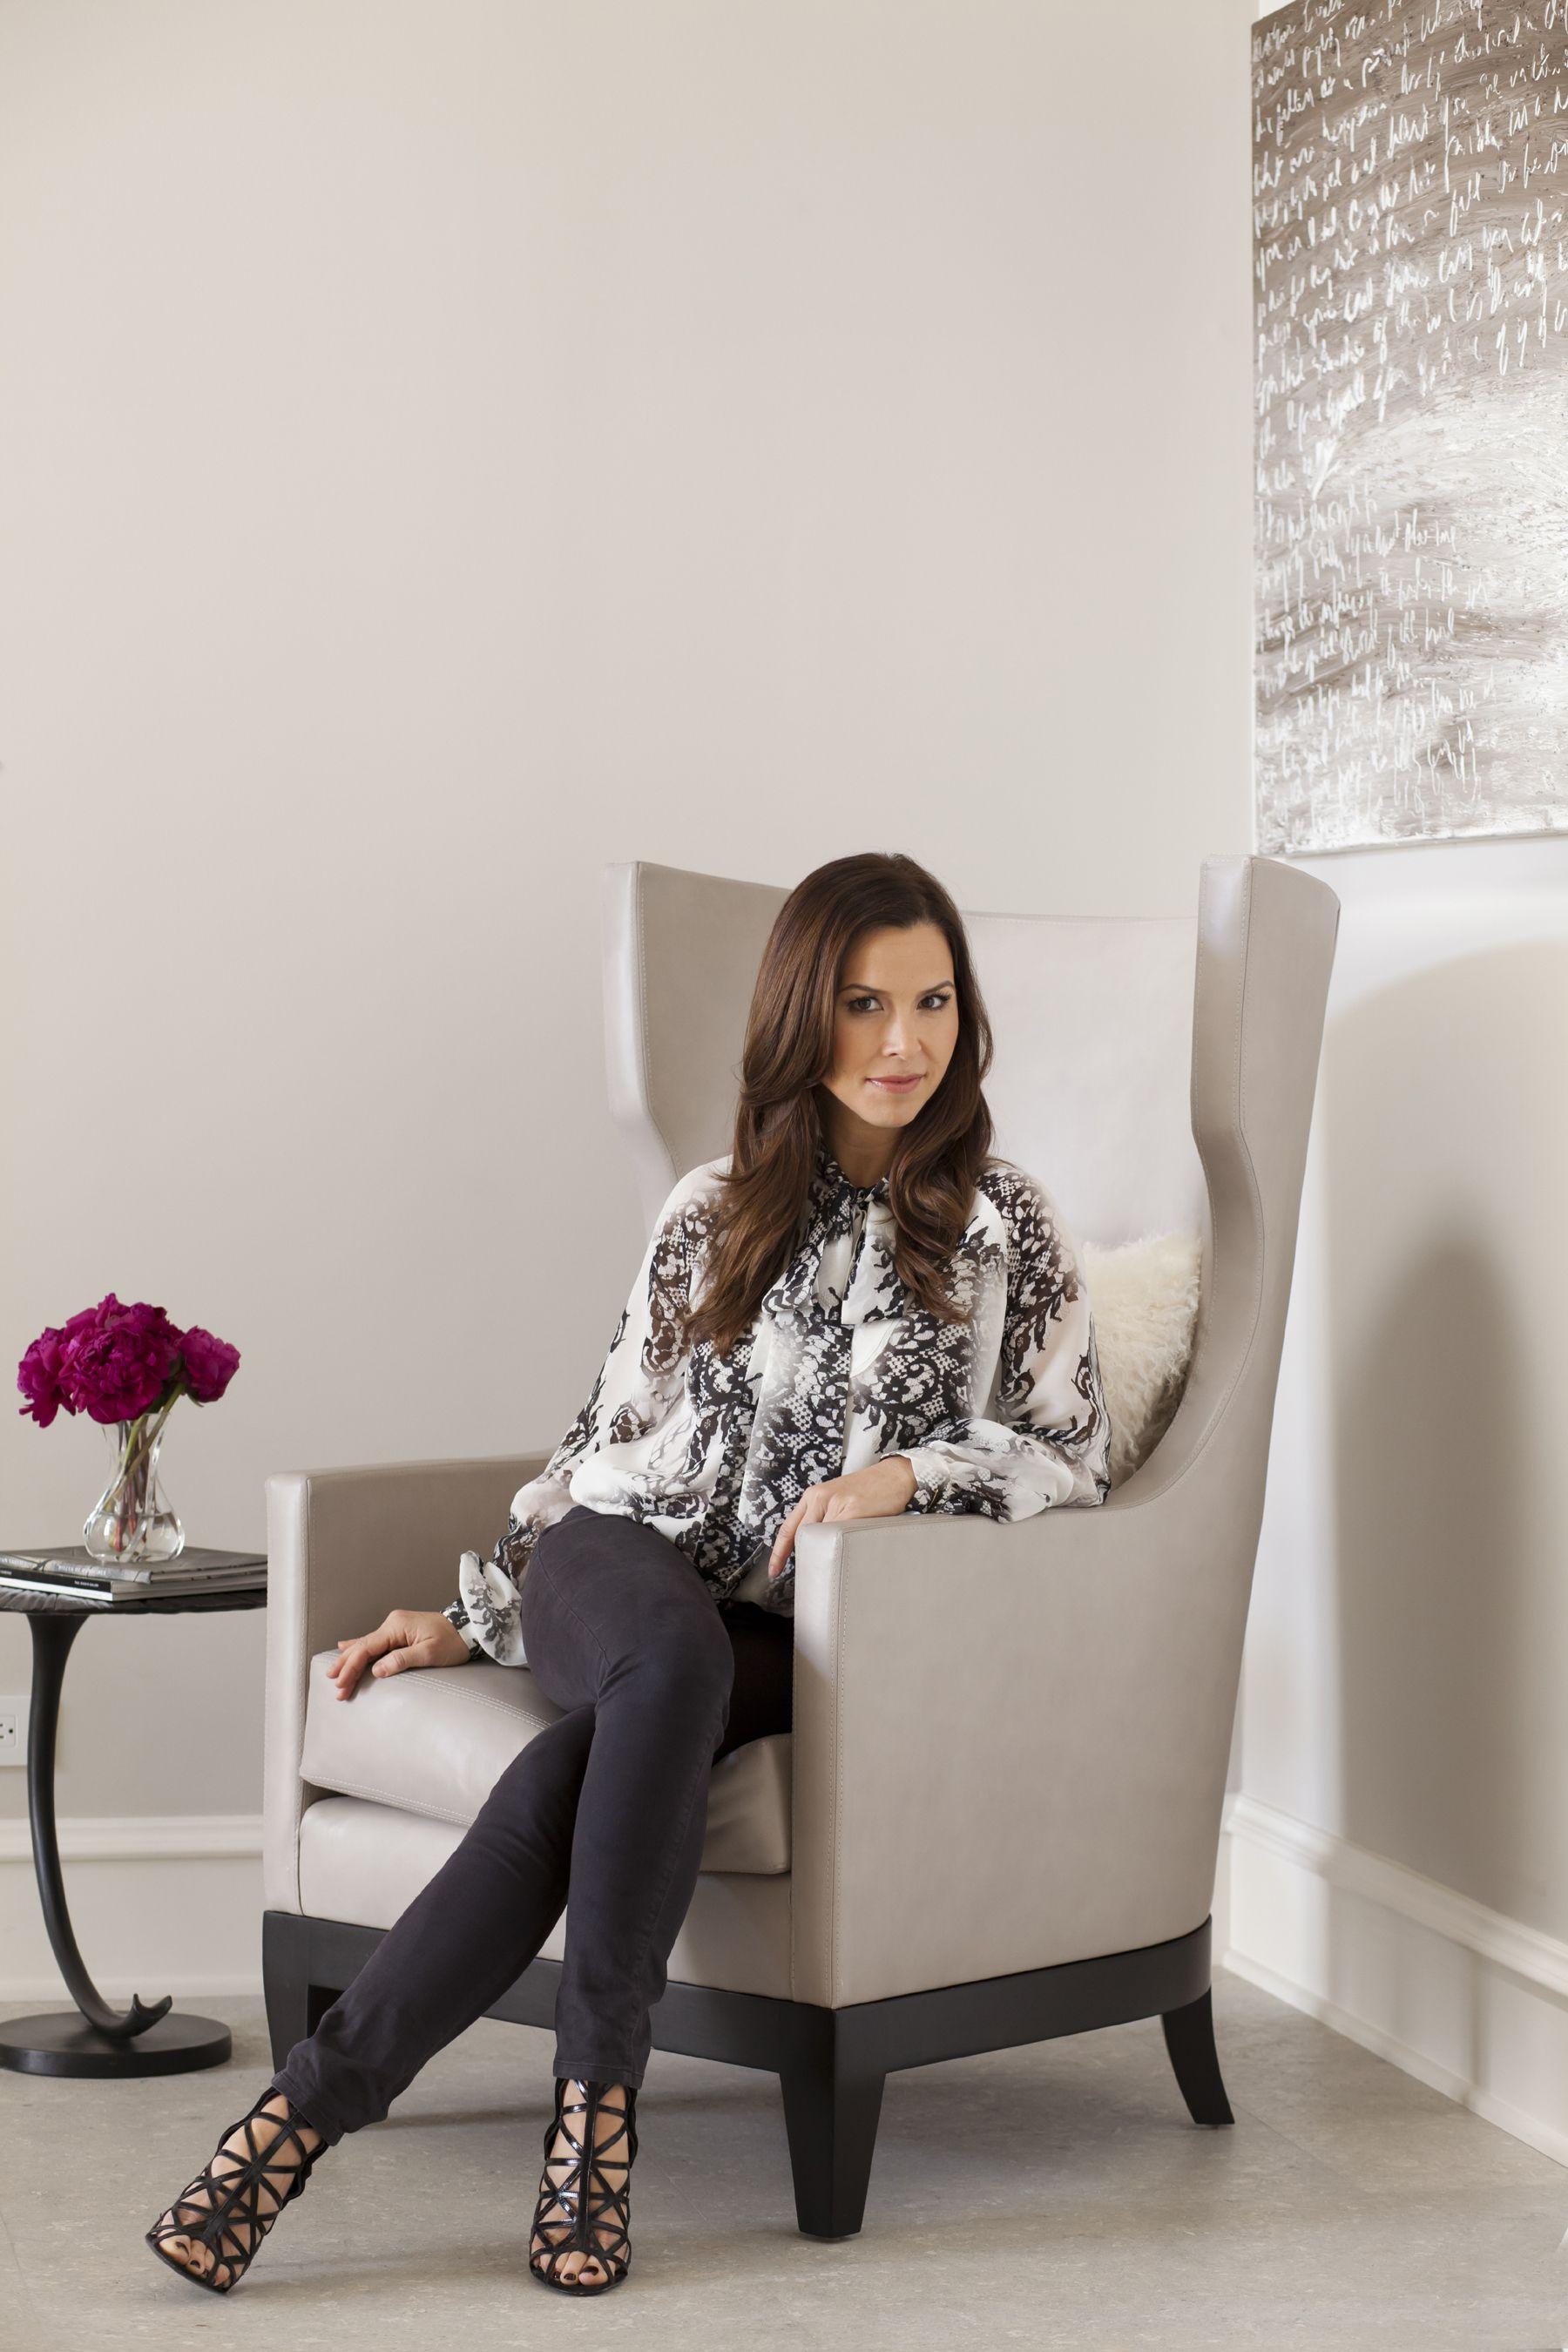 Women Of Style Monique Lhuillier Fashion Fashion Design Filipino Fashion